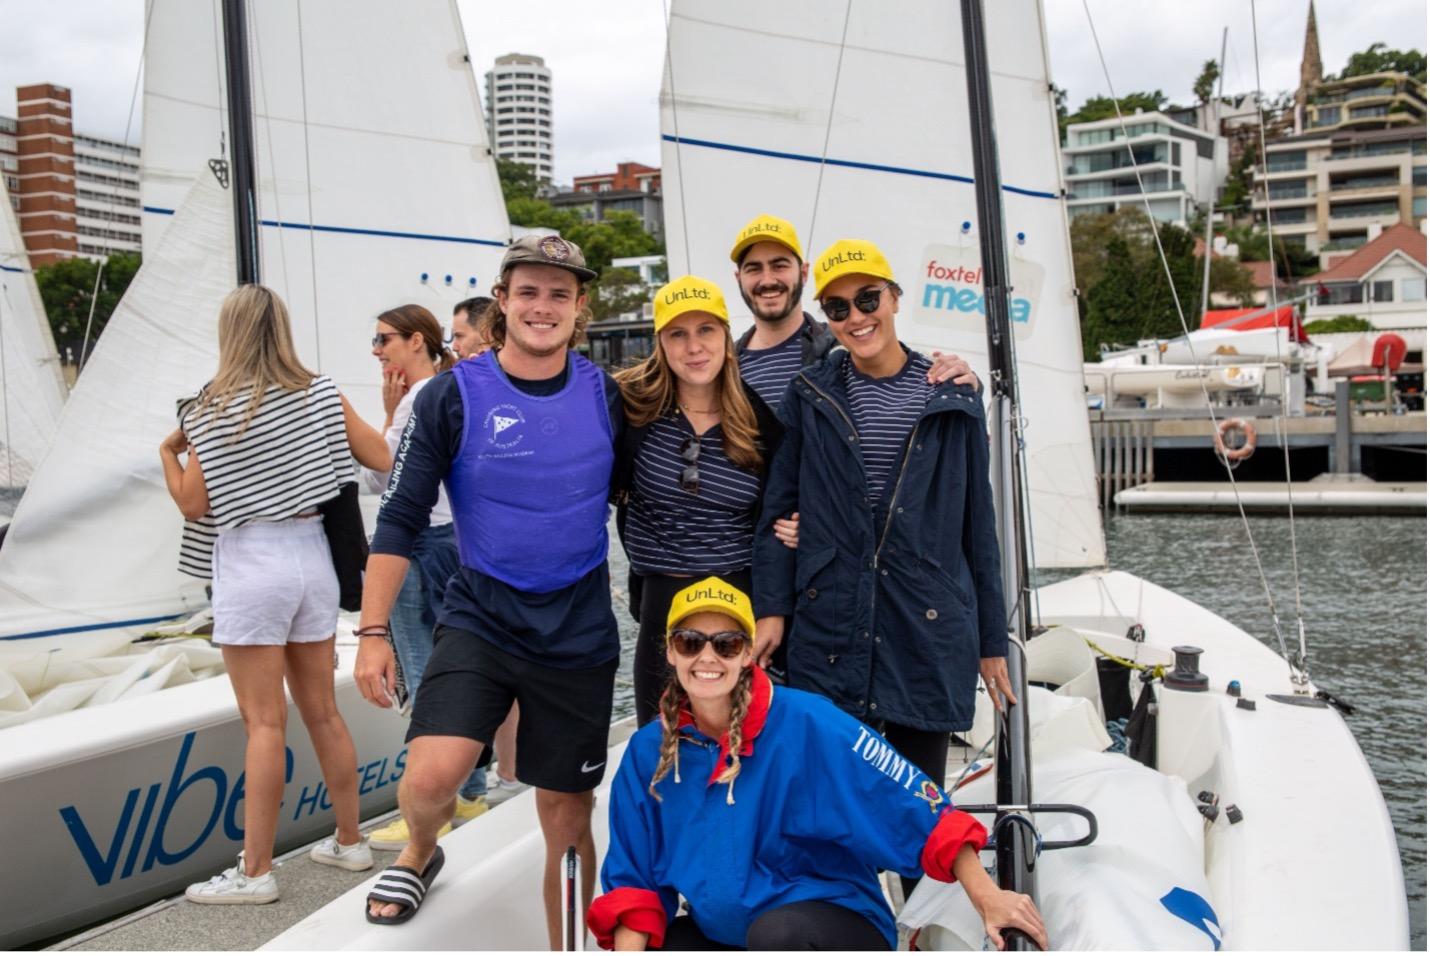 UnLtd's Big Splash raises $95K for children at risk; Seven West Media sails to victory